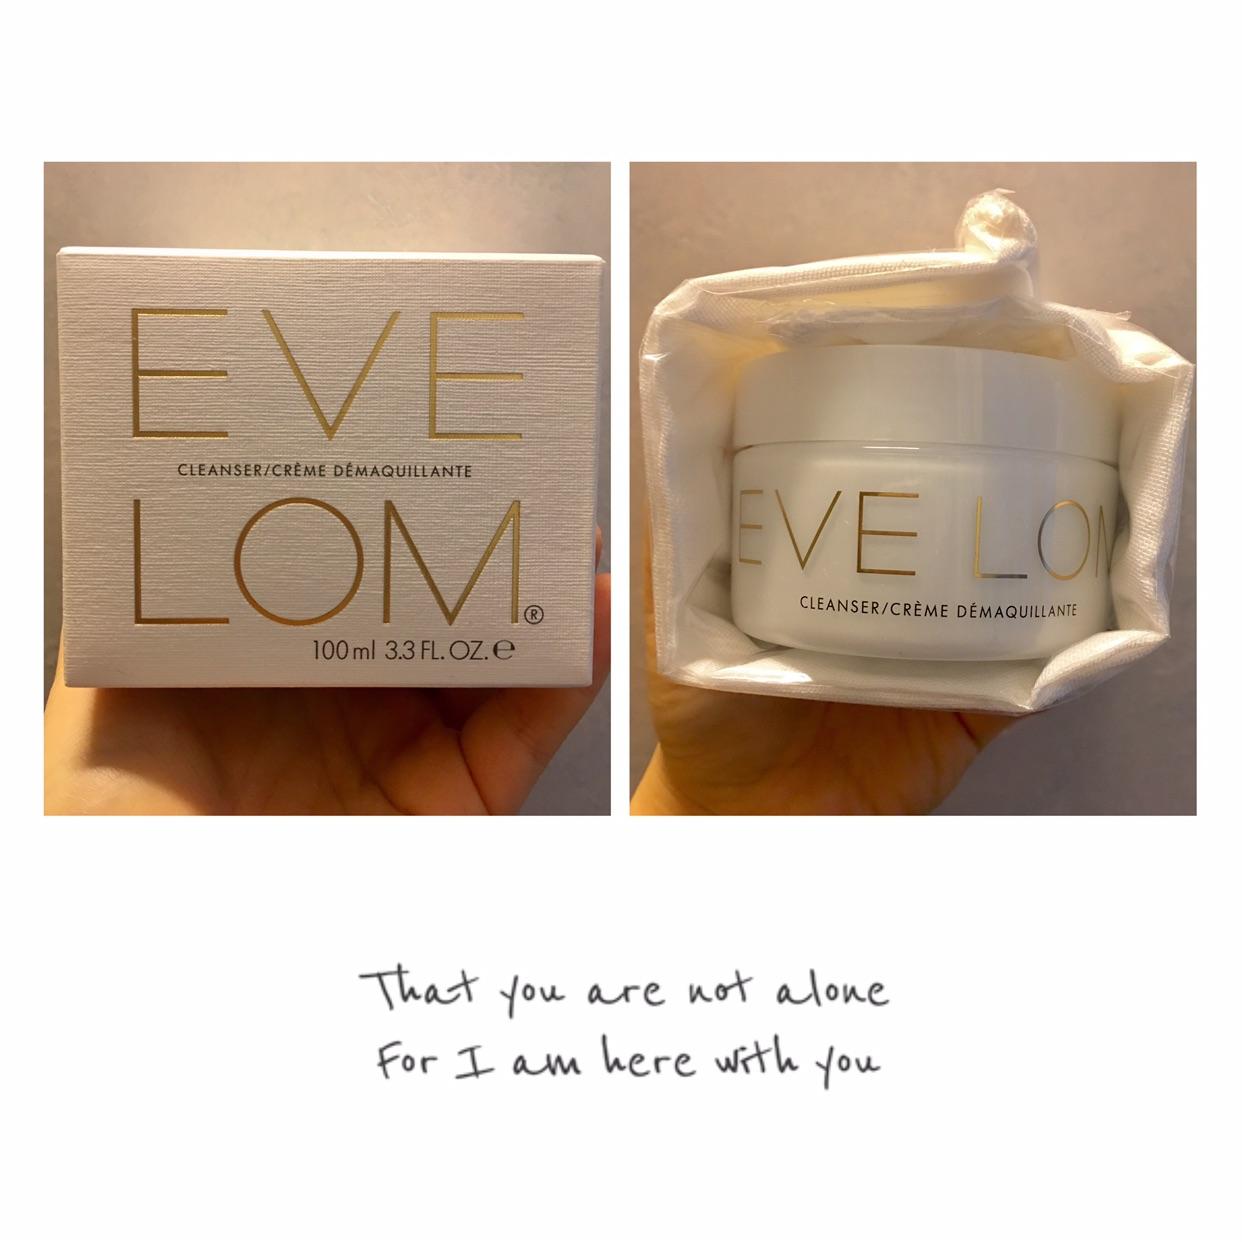 Eve Lom 卸妆膏&急救面膜&亮白面霜